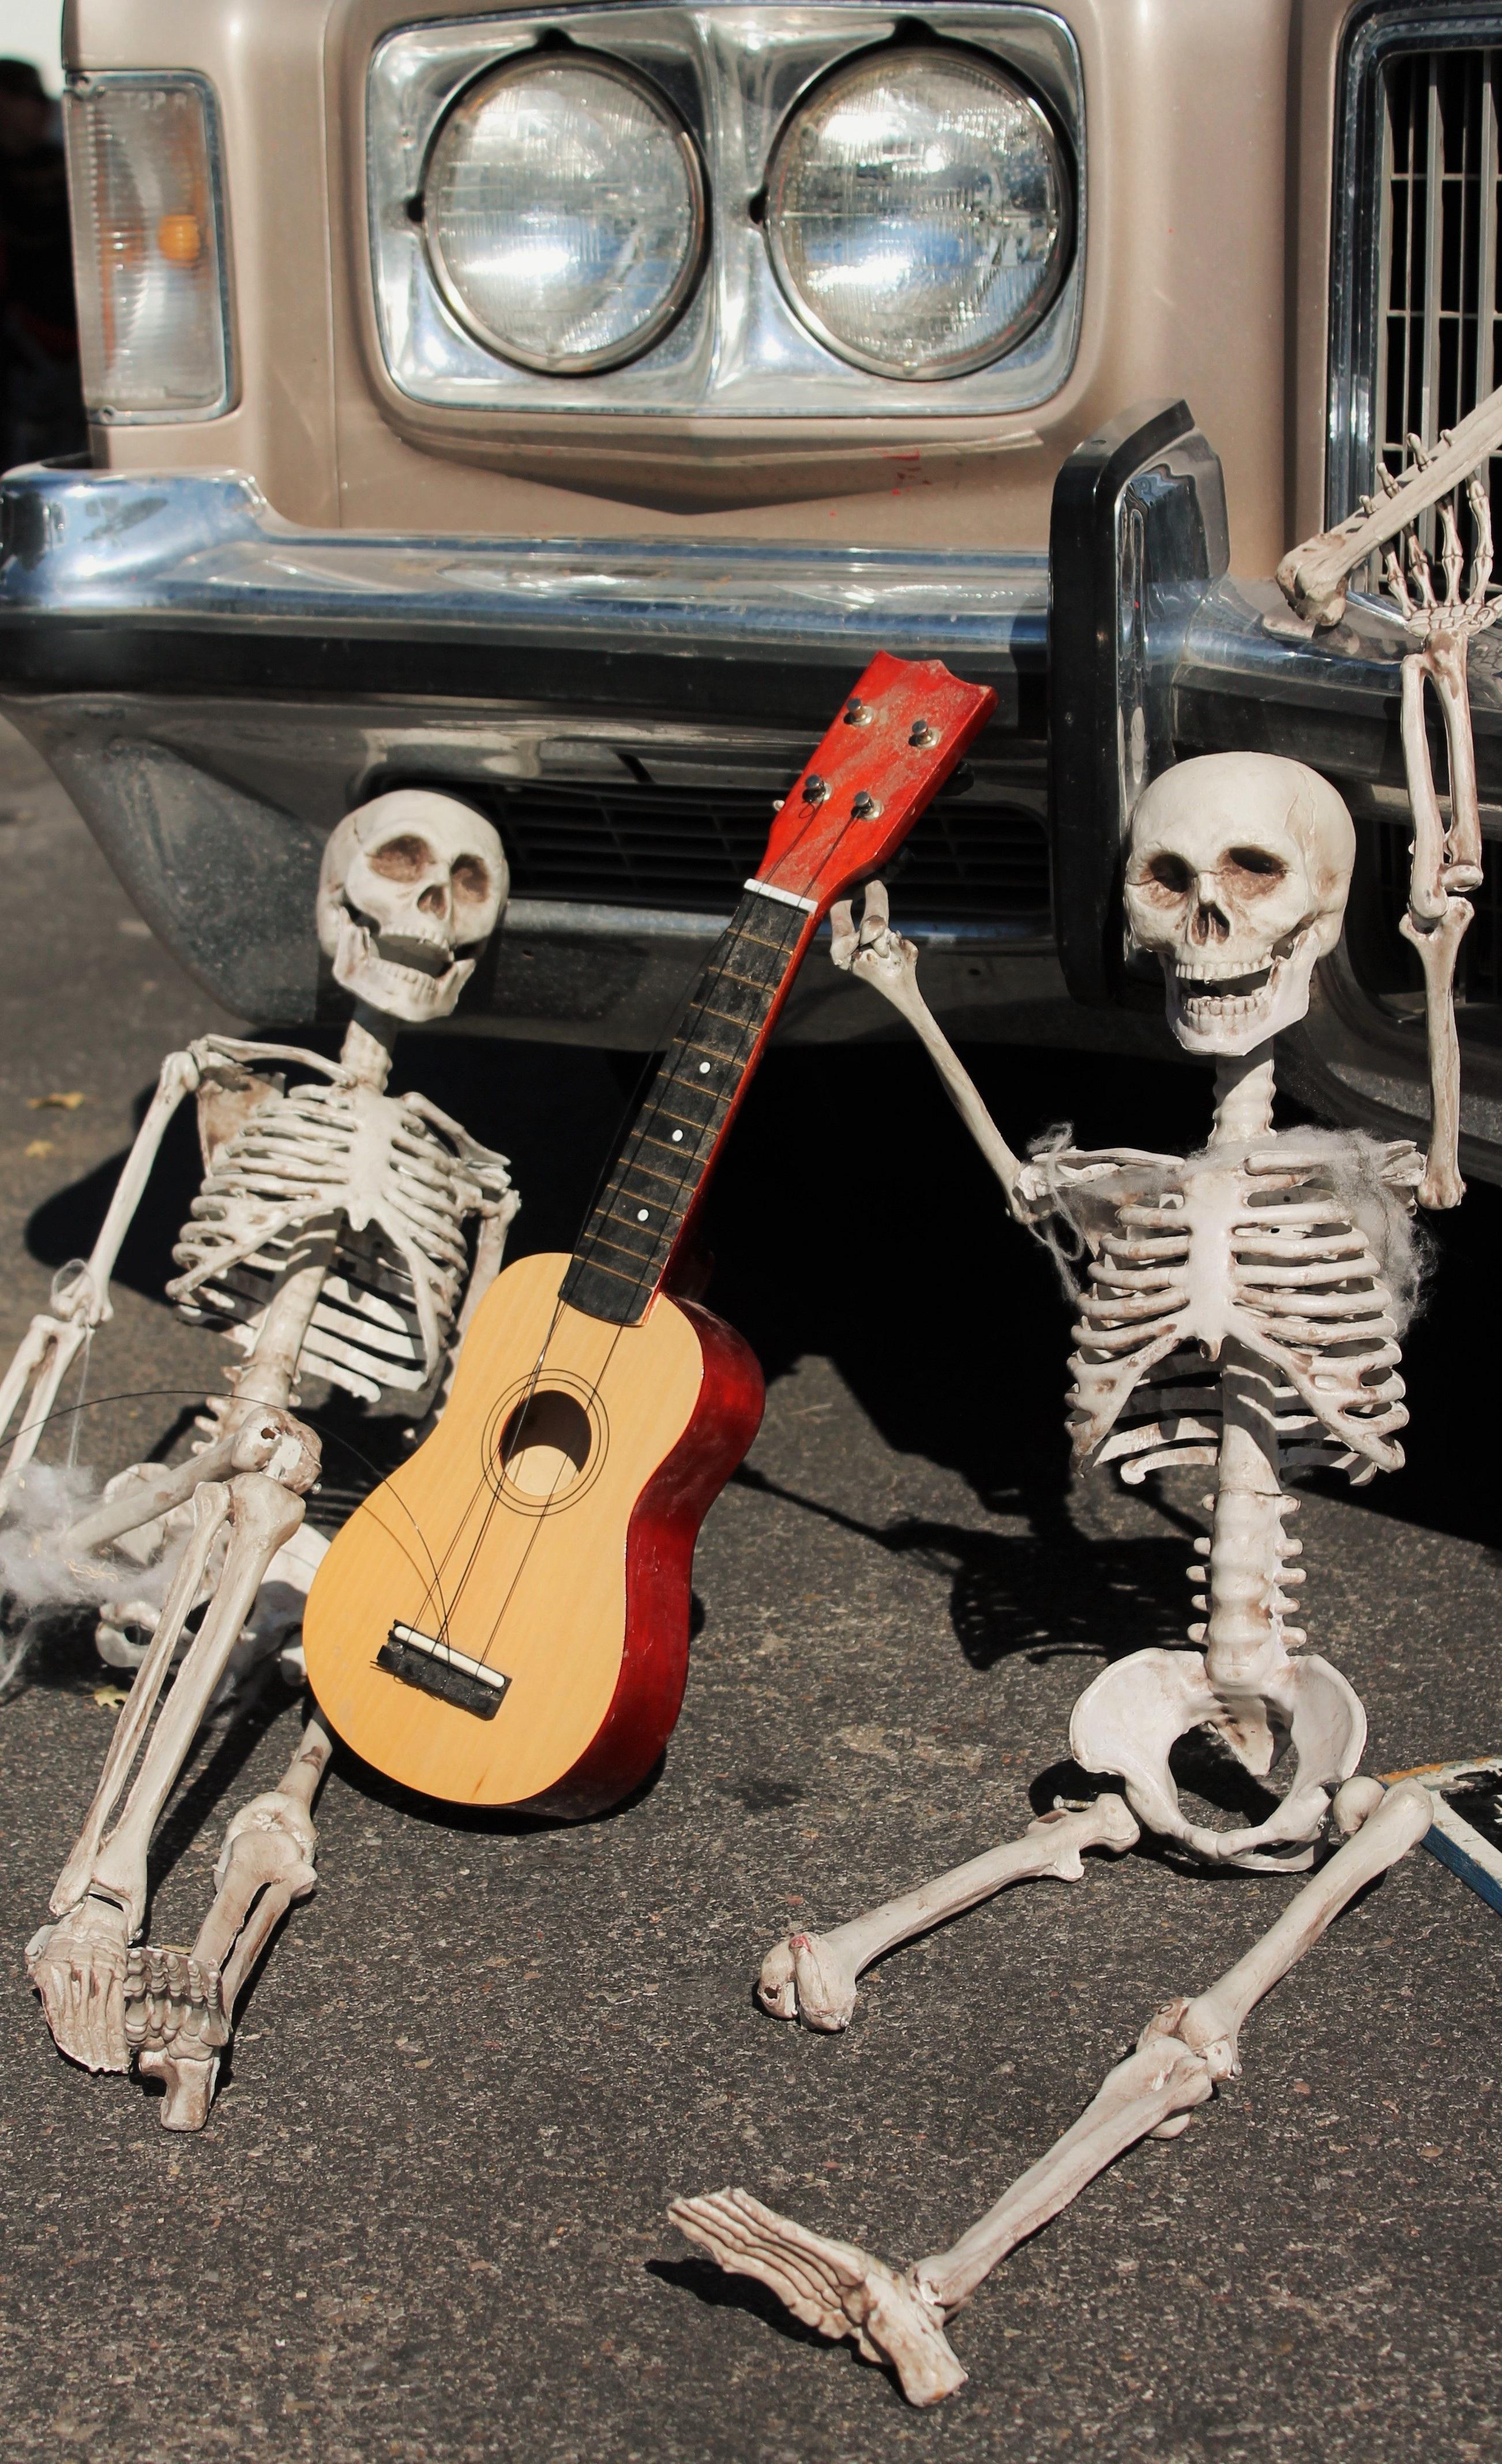 free images spooky celebration musician death gothic bone musical instrument festive. Black Bedroom Furniture Sets. Home Design Ideas